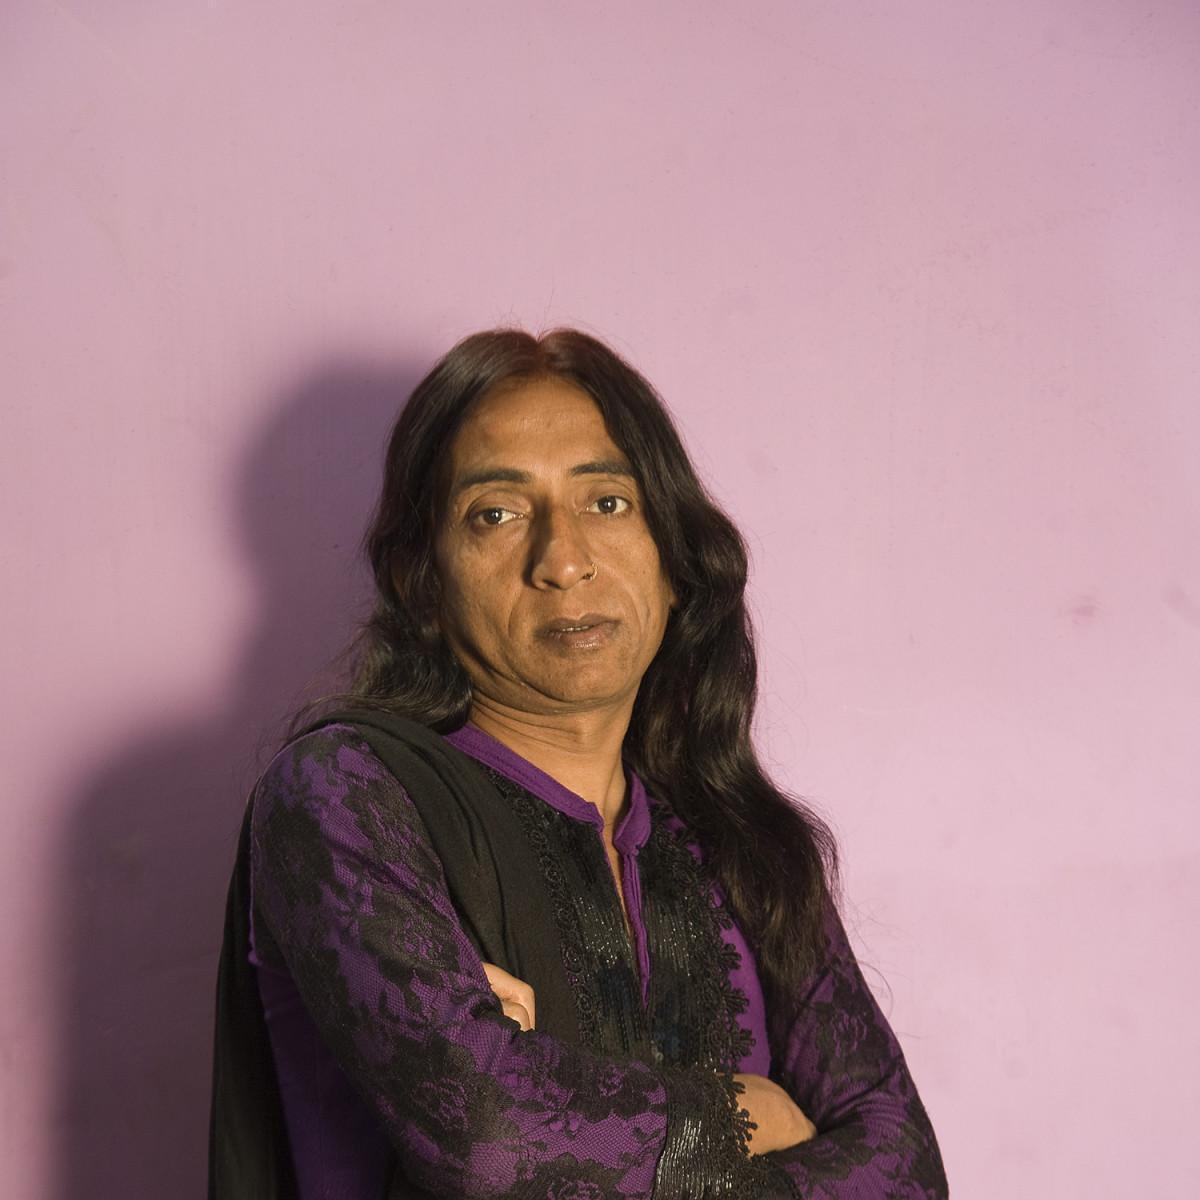 FotoFest Charan Singh Untitled #16